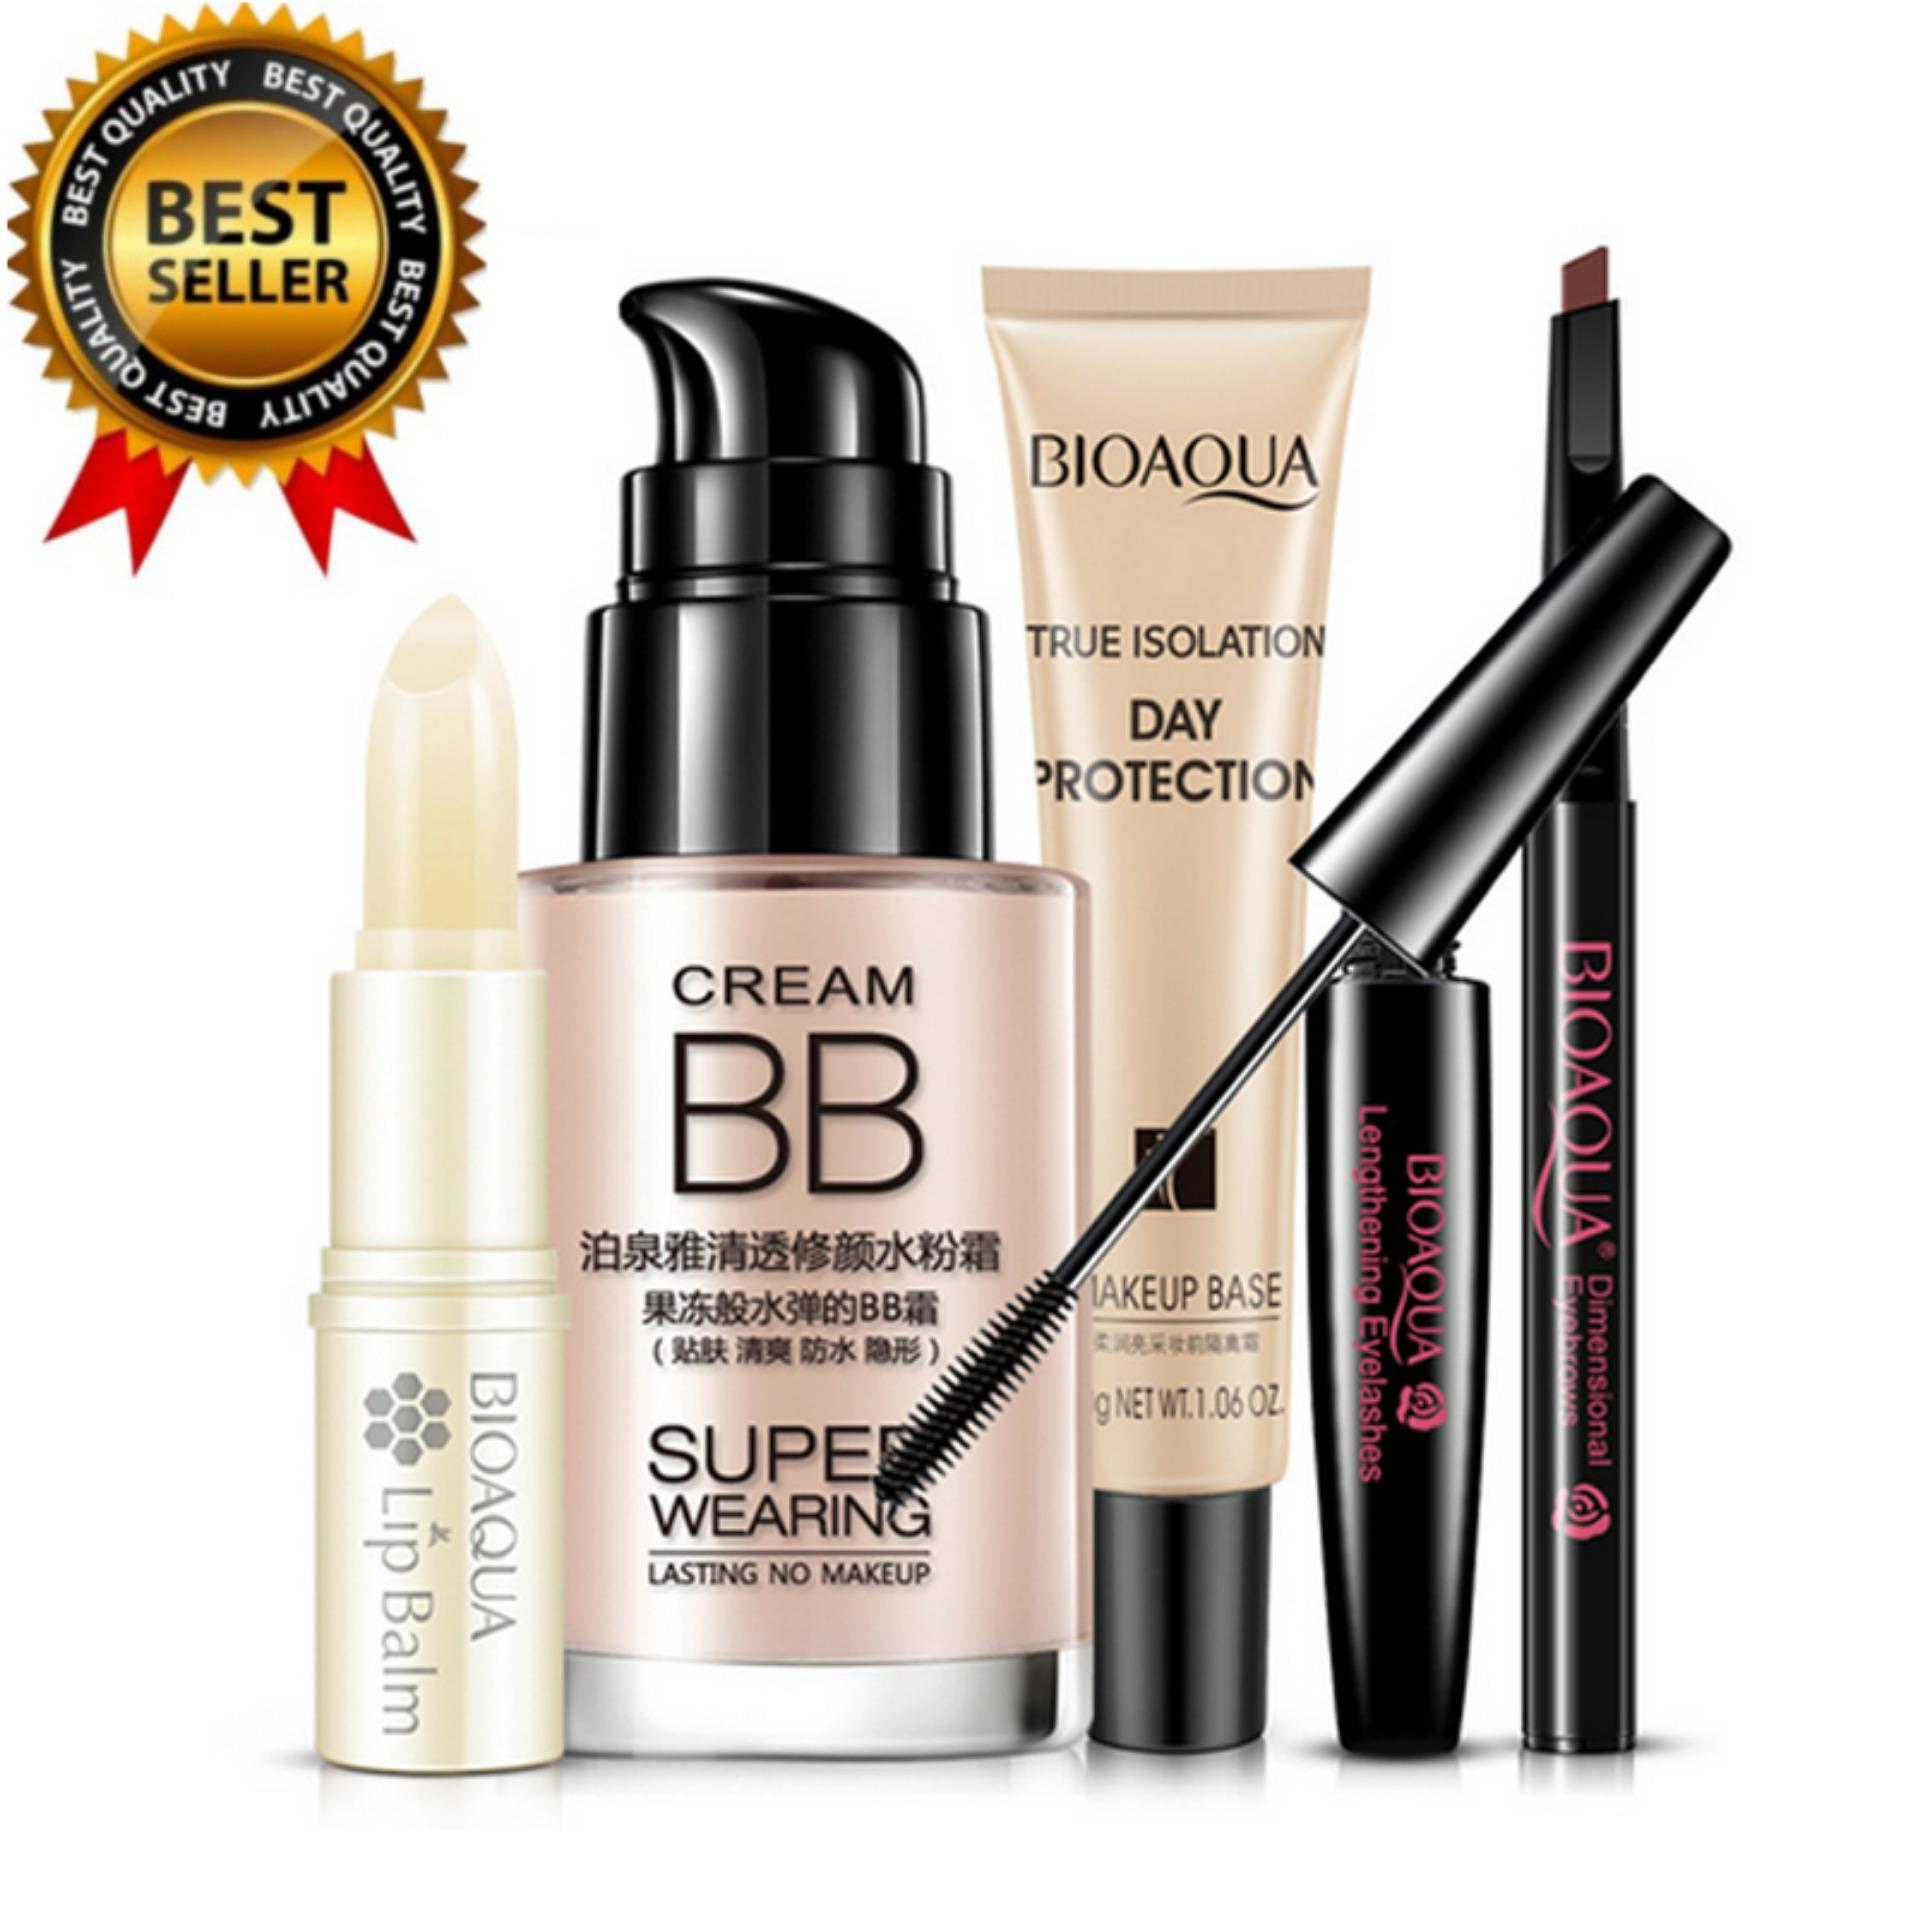 BIOAQUA Bright Cosmetics Makeup Set Lip Balm BB Cream Eyebrow Pencil Mascara Cream Makeup Base 5pcs